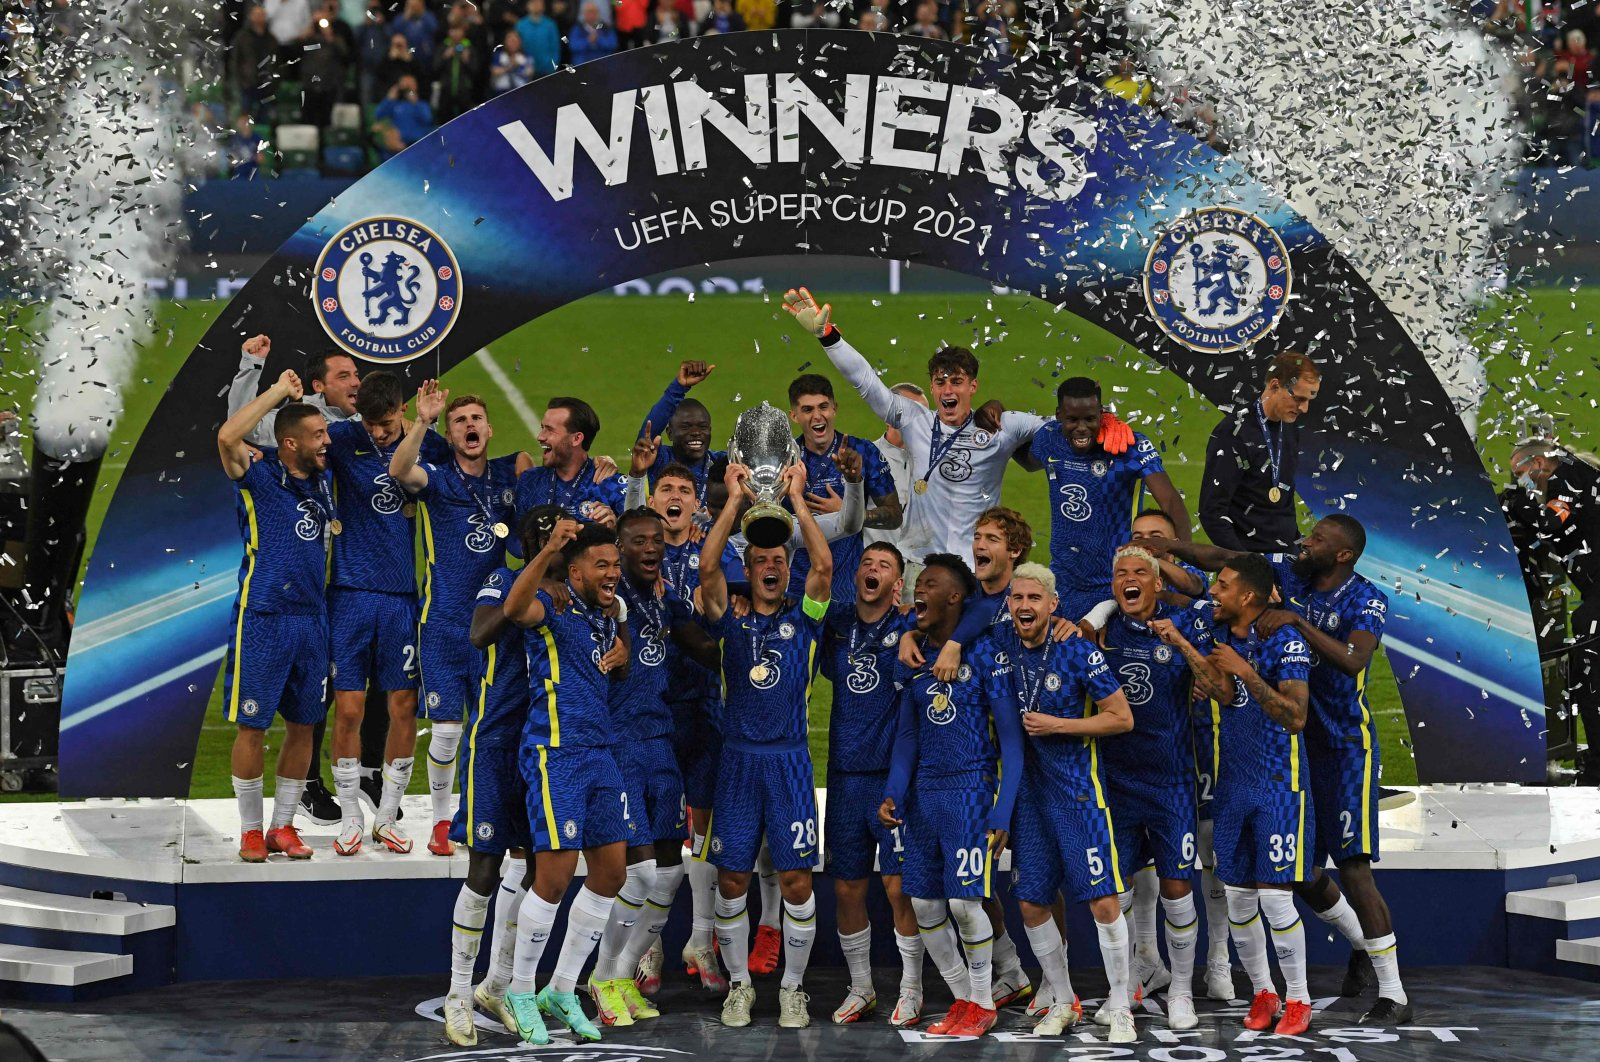 Chelsea's Spanish defender Cesar Azpilicueta (C) raises the trophy after Chelsea won the UEFA Super Cup match against Villarreal at Windsor Park in Belfast, Aug. 11, 2021. (AFP Photo)